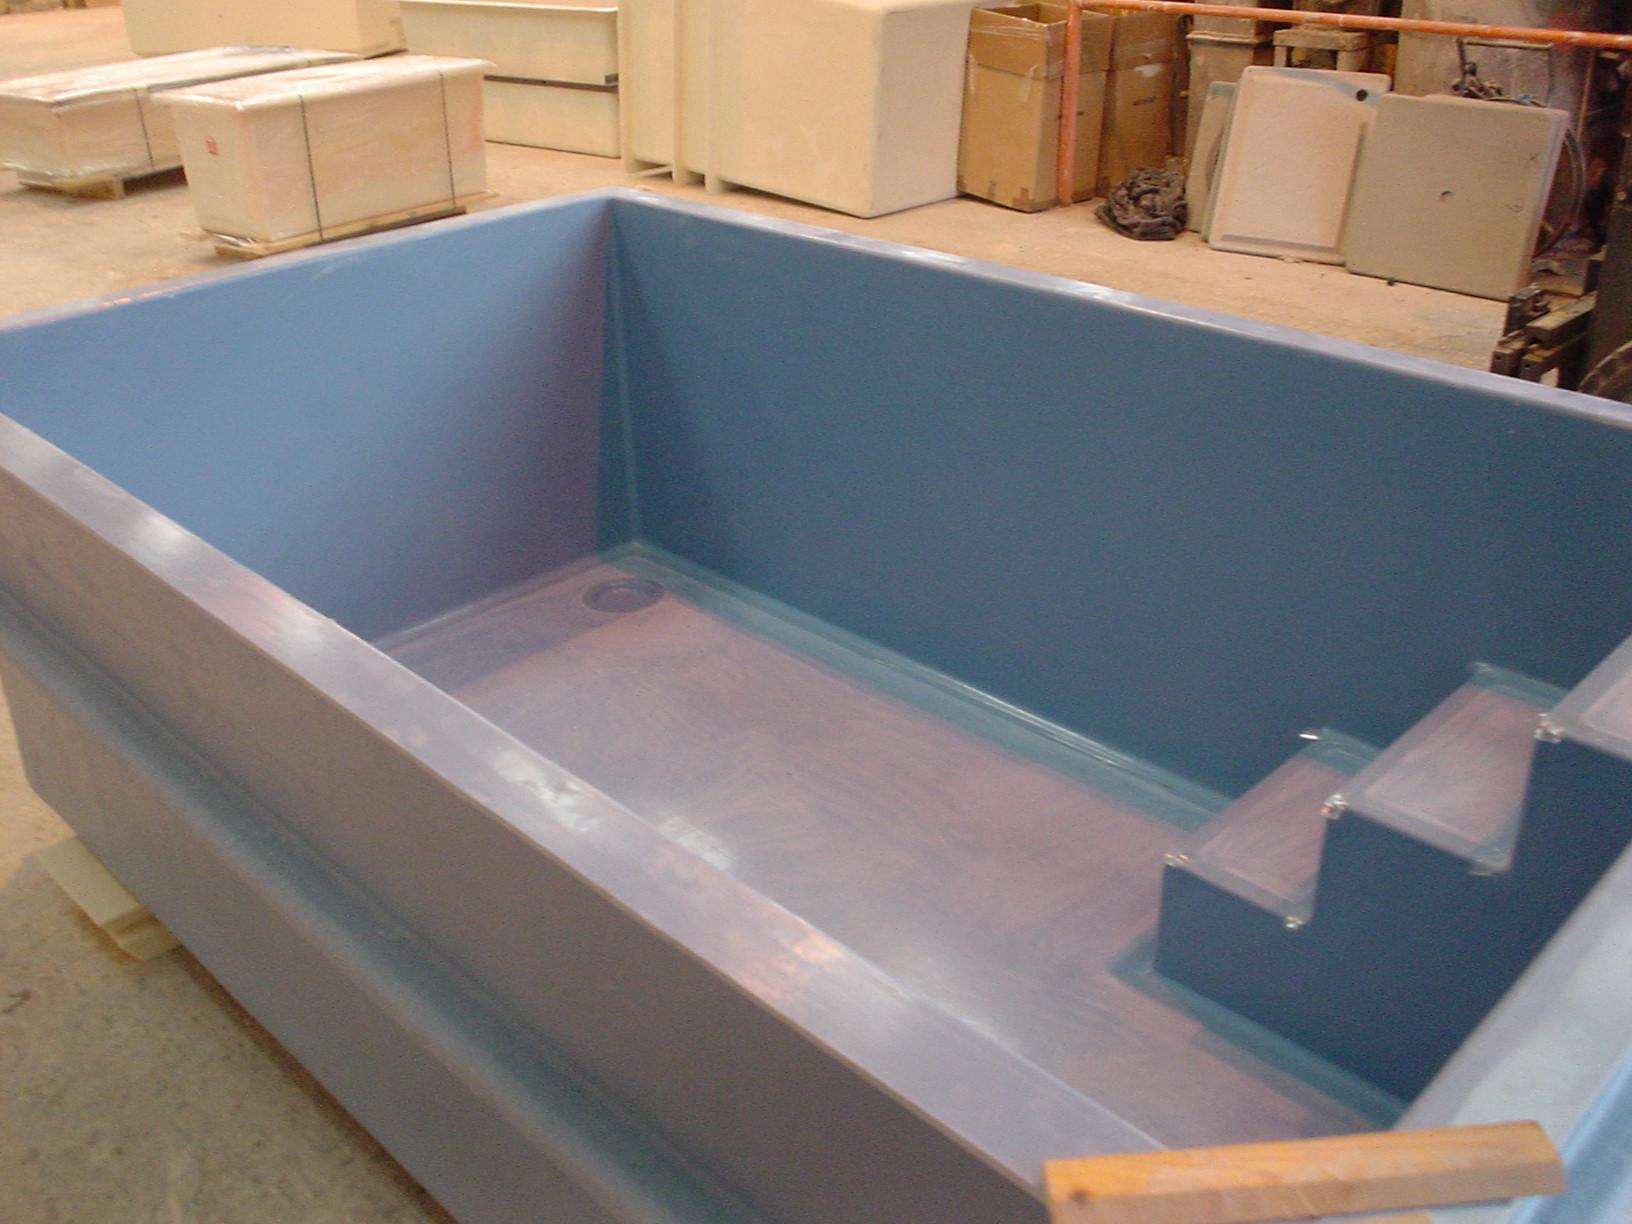 baptismal tank